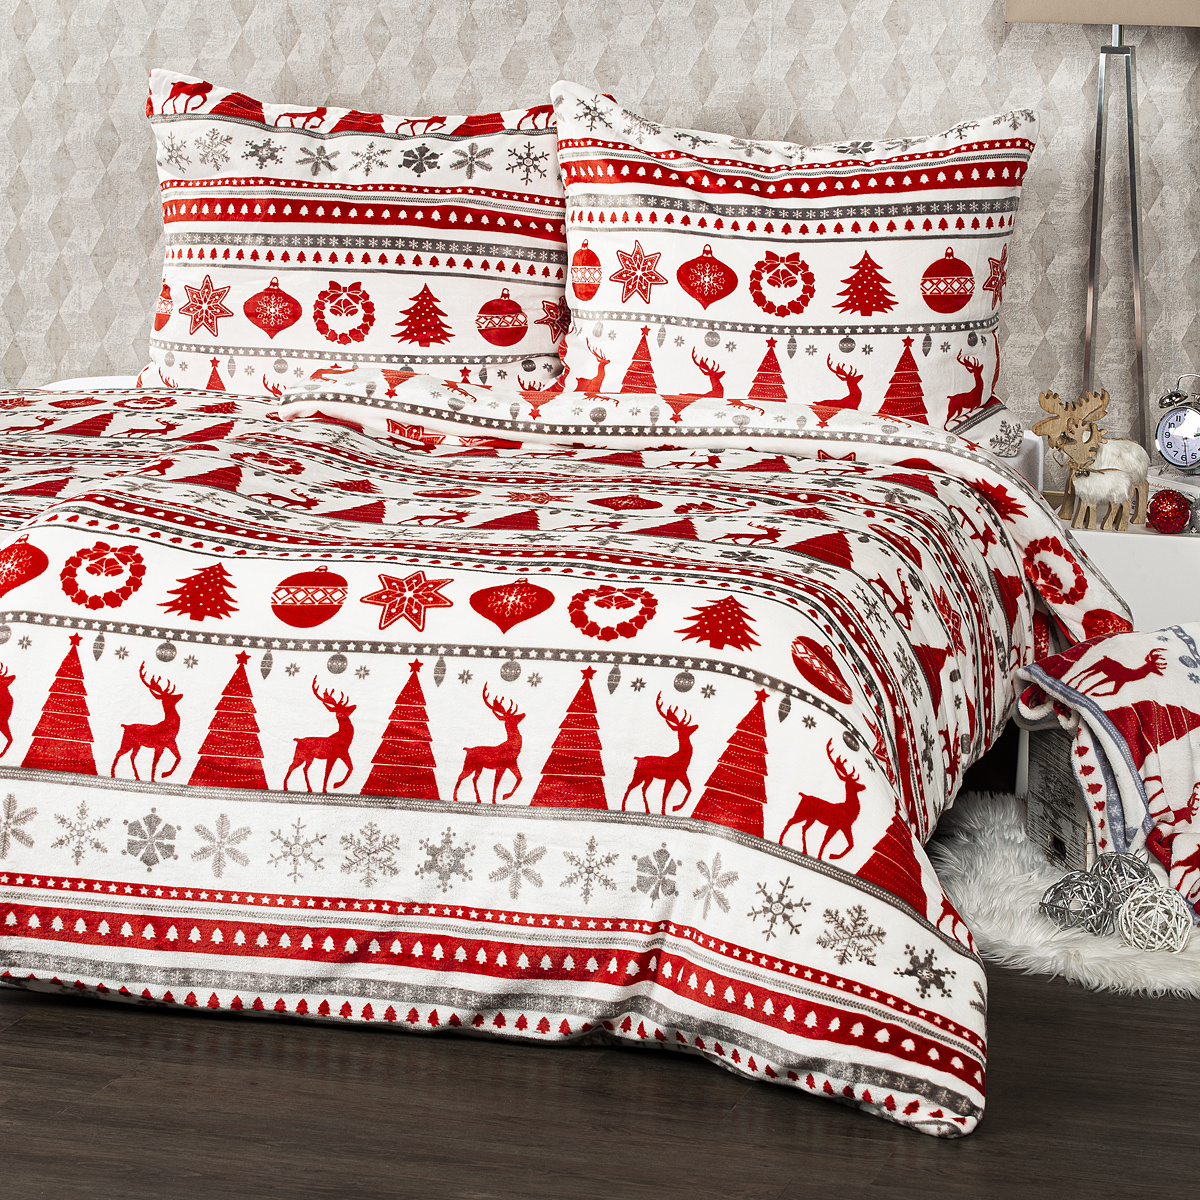 4Home Christmas Time mikroflanel ágynemű, piros, 140 x 200 cm, 70 x 90 cm, 140 x 200 cm, 70 x 90 cm